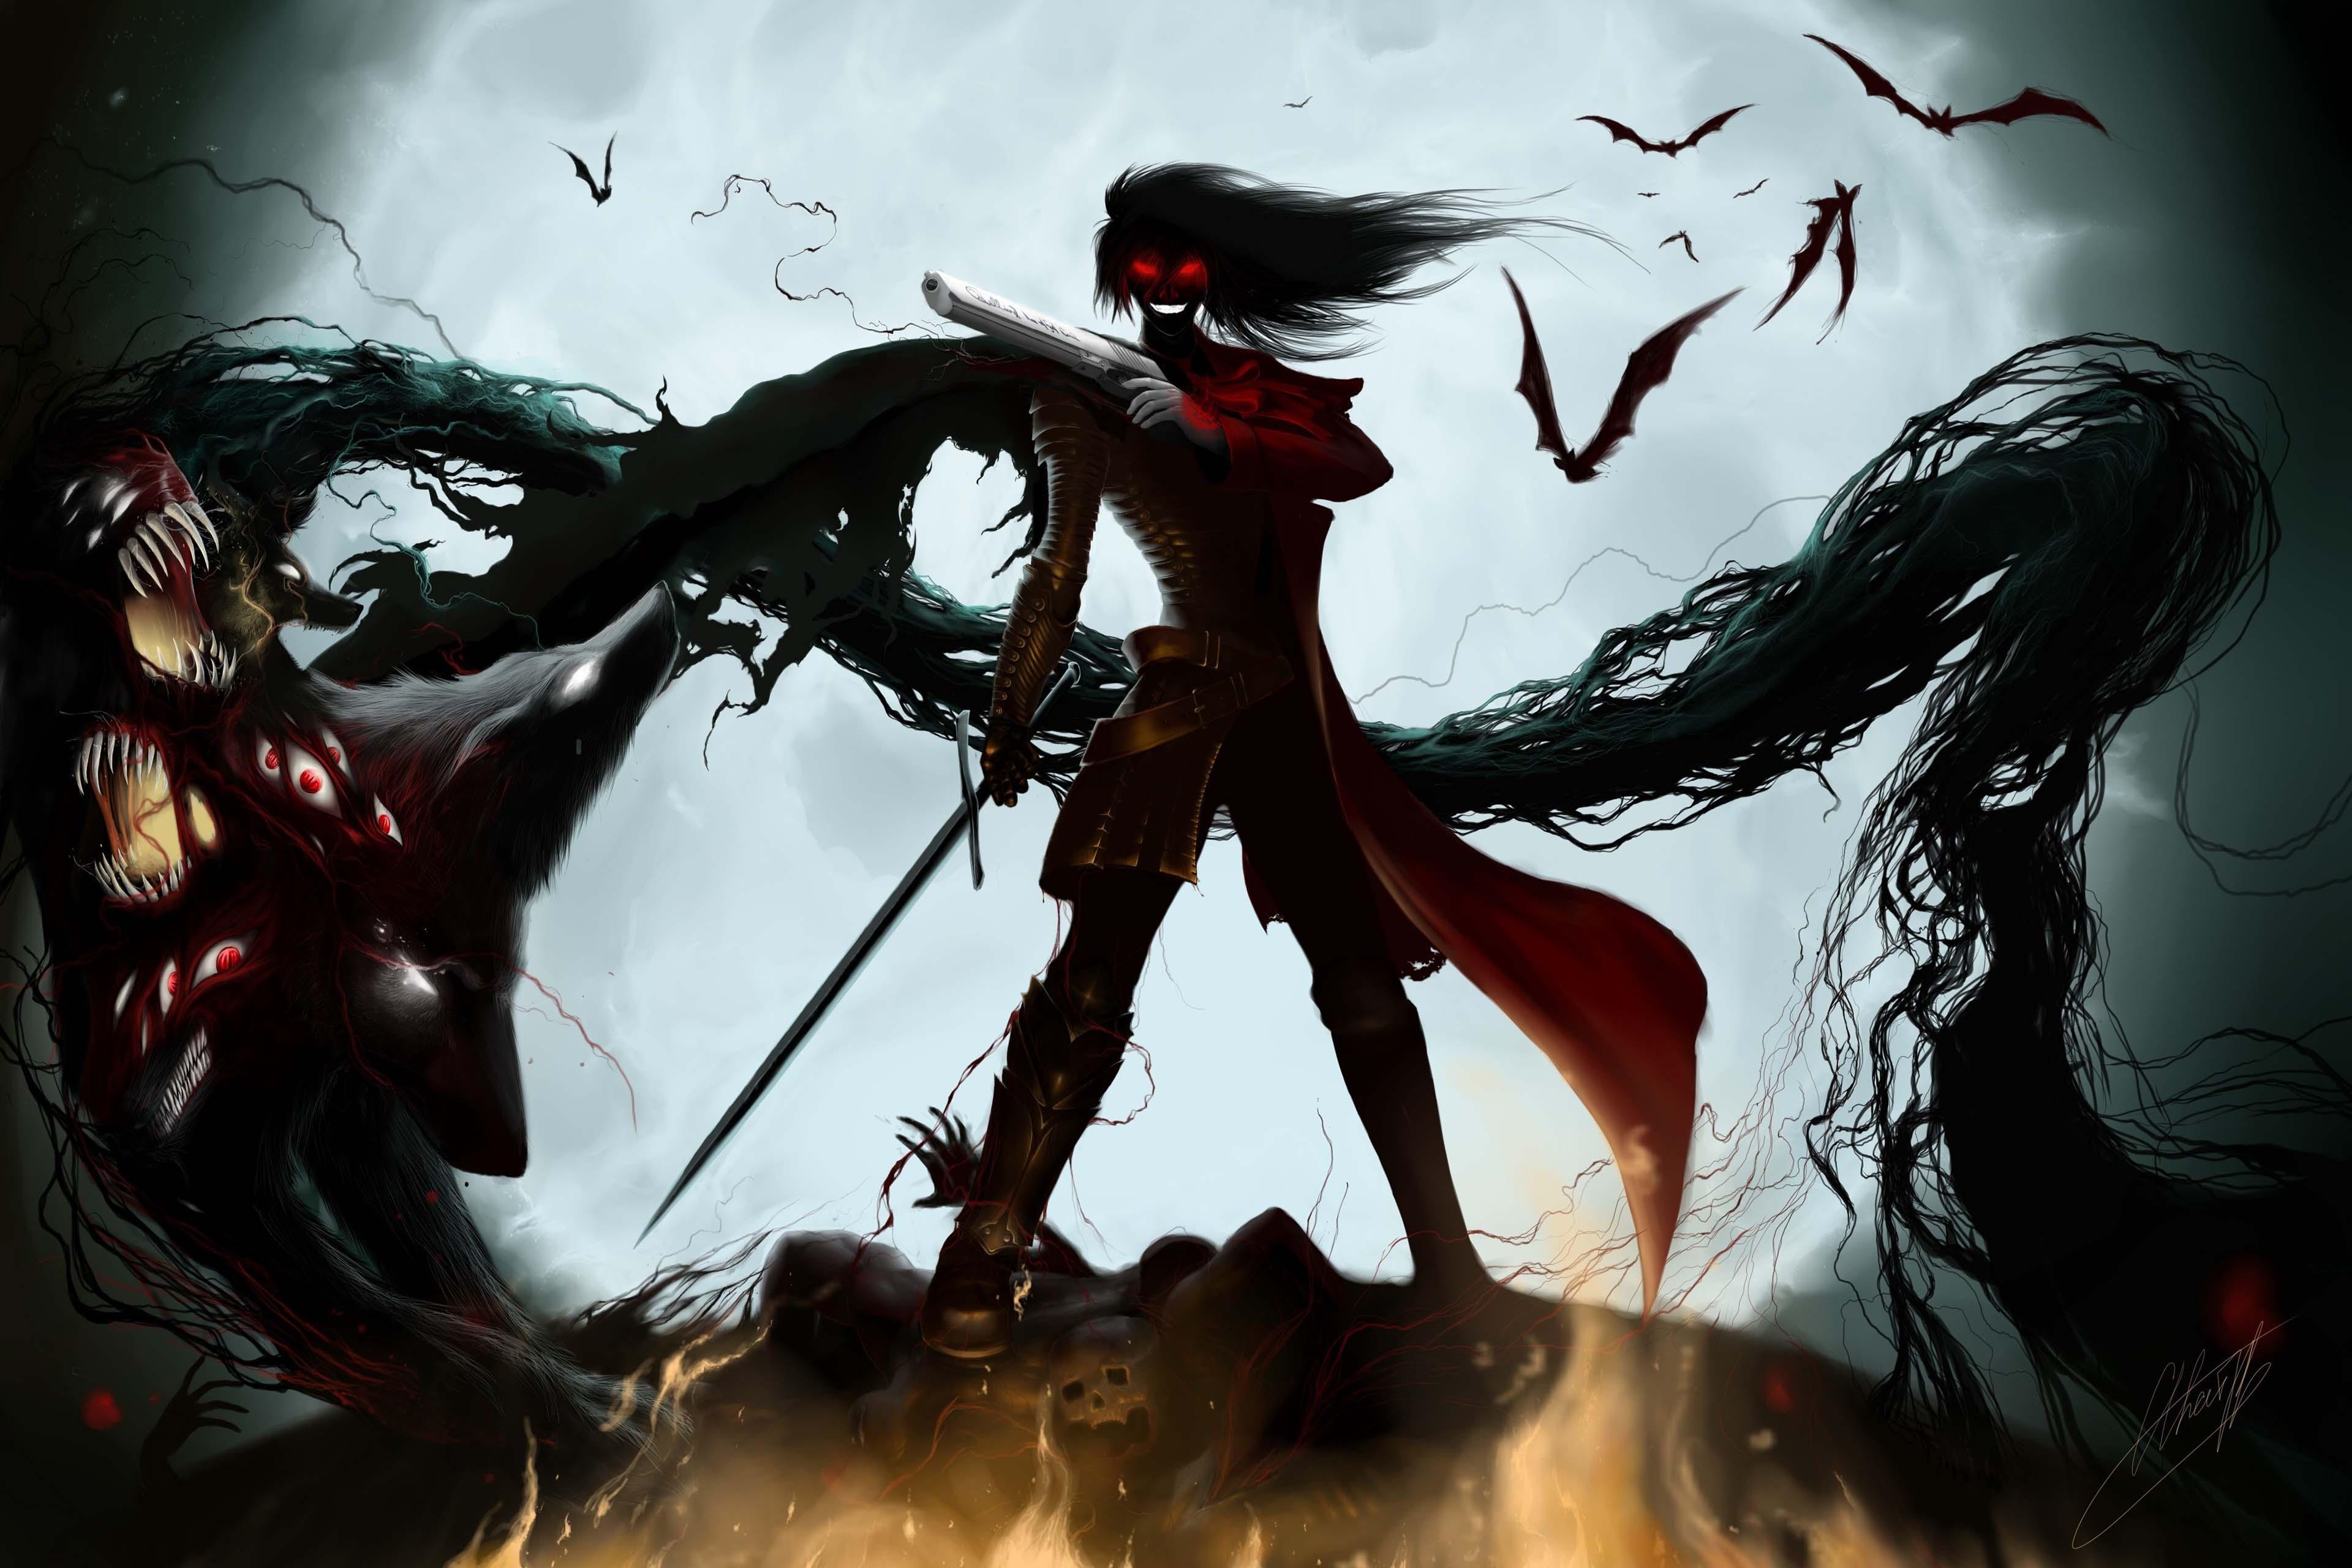 File Hellsing-Alucard-Demon-Vampire-bats-Guns-Burning-eyes jpgVampire Alucard